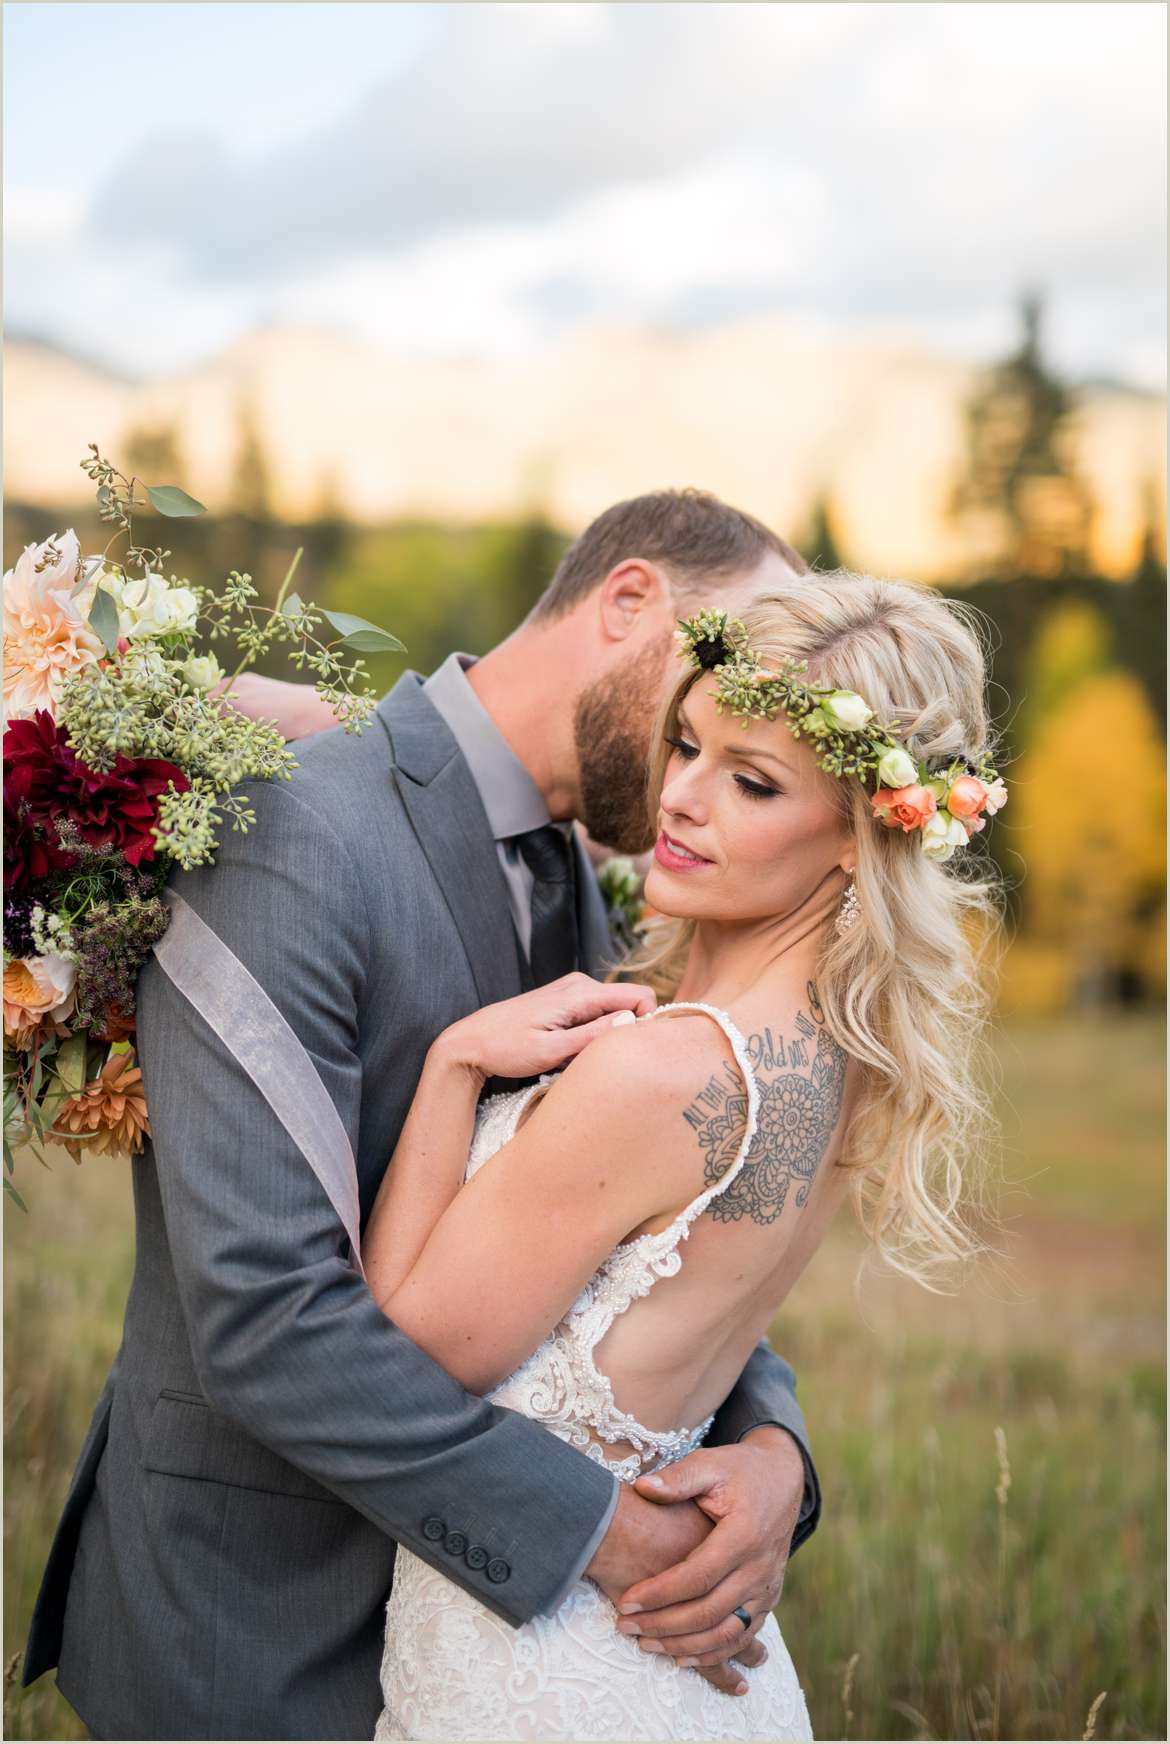 groom kisses bride on cheek